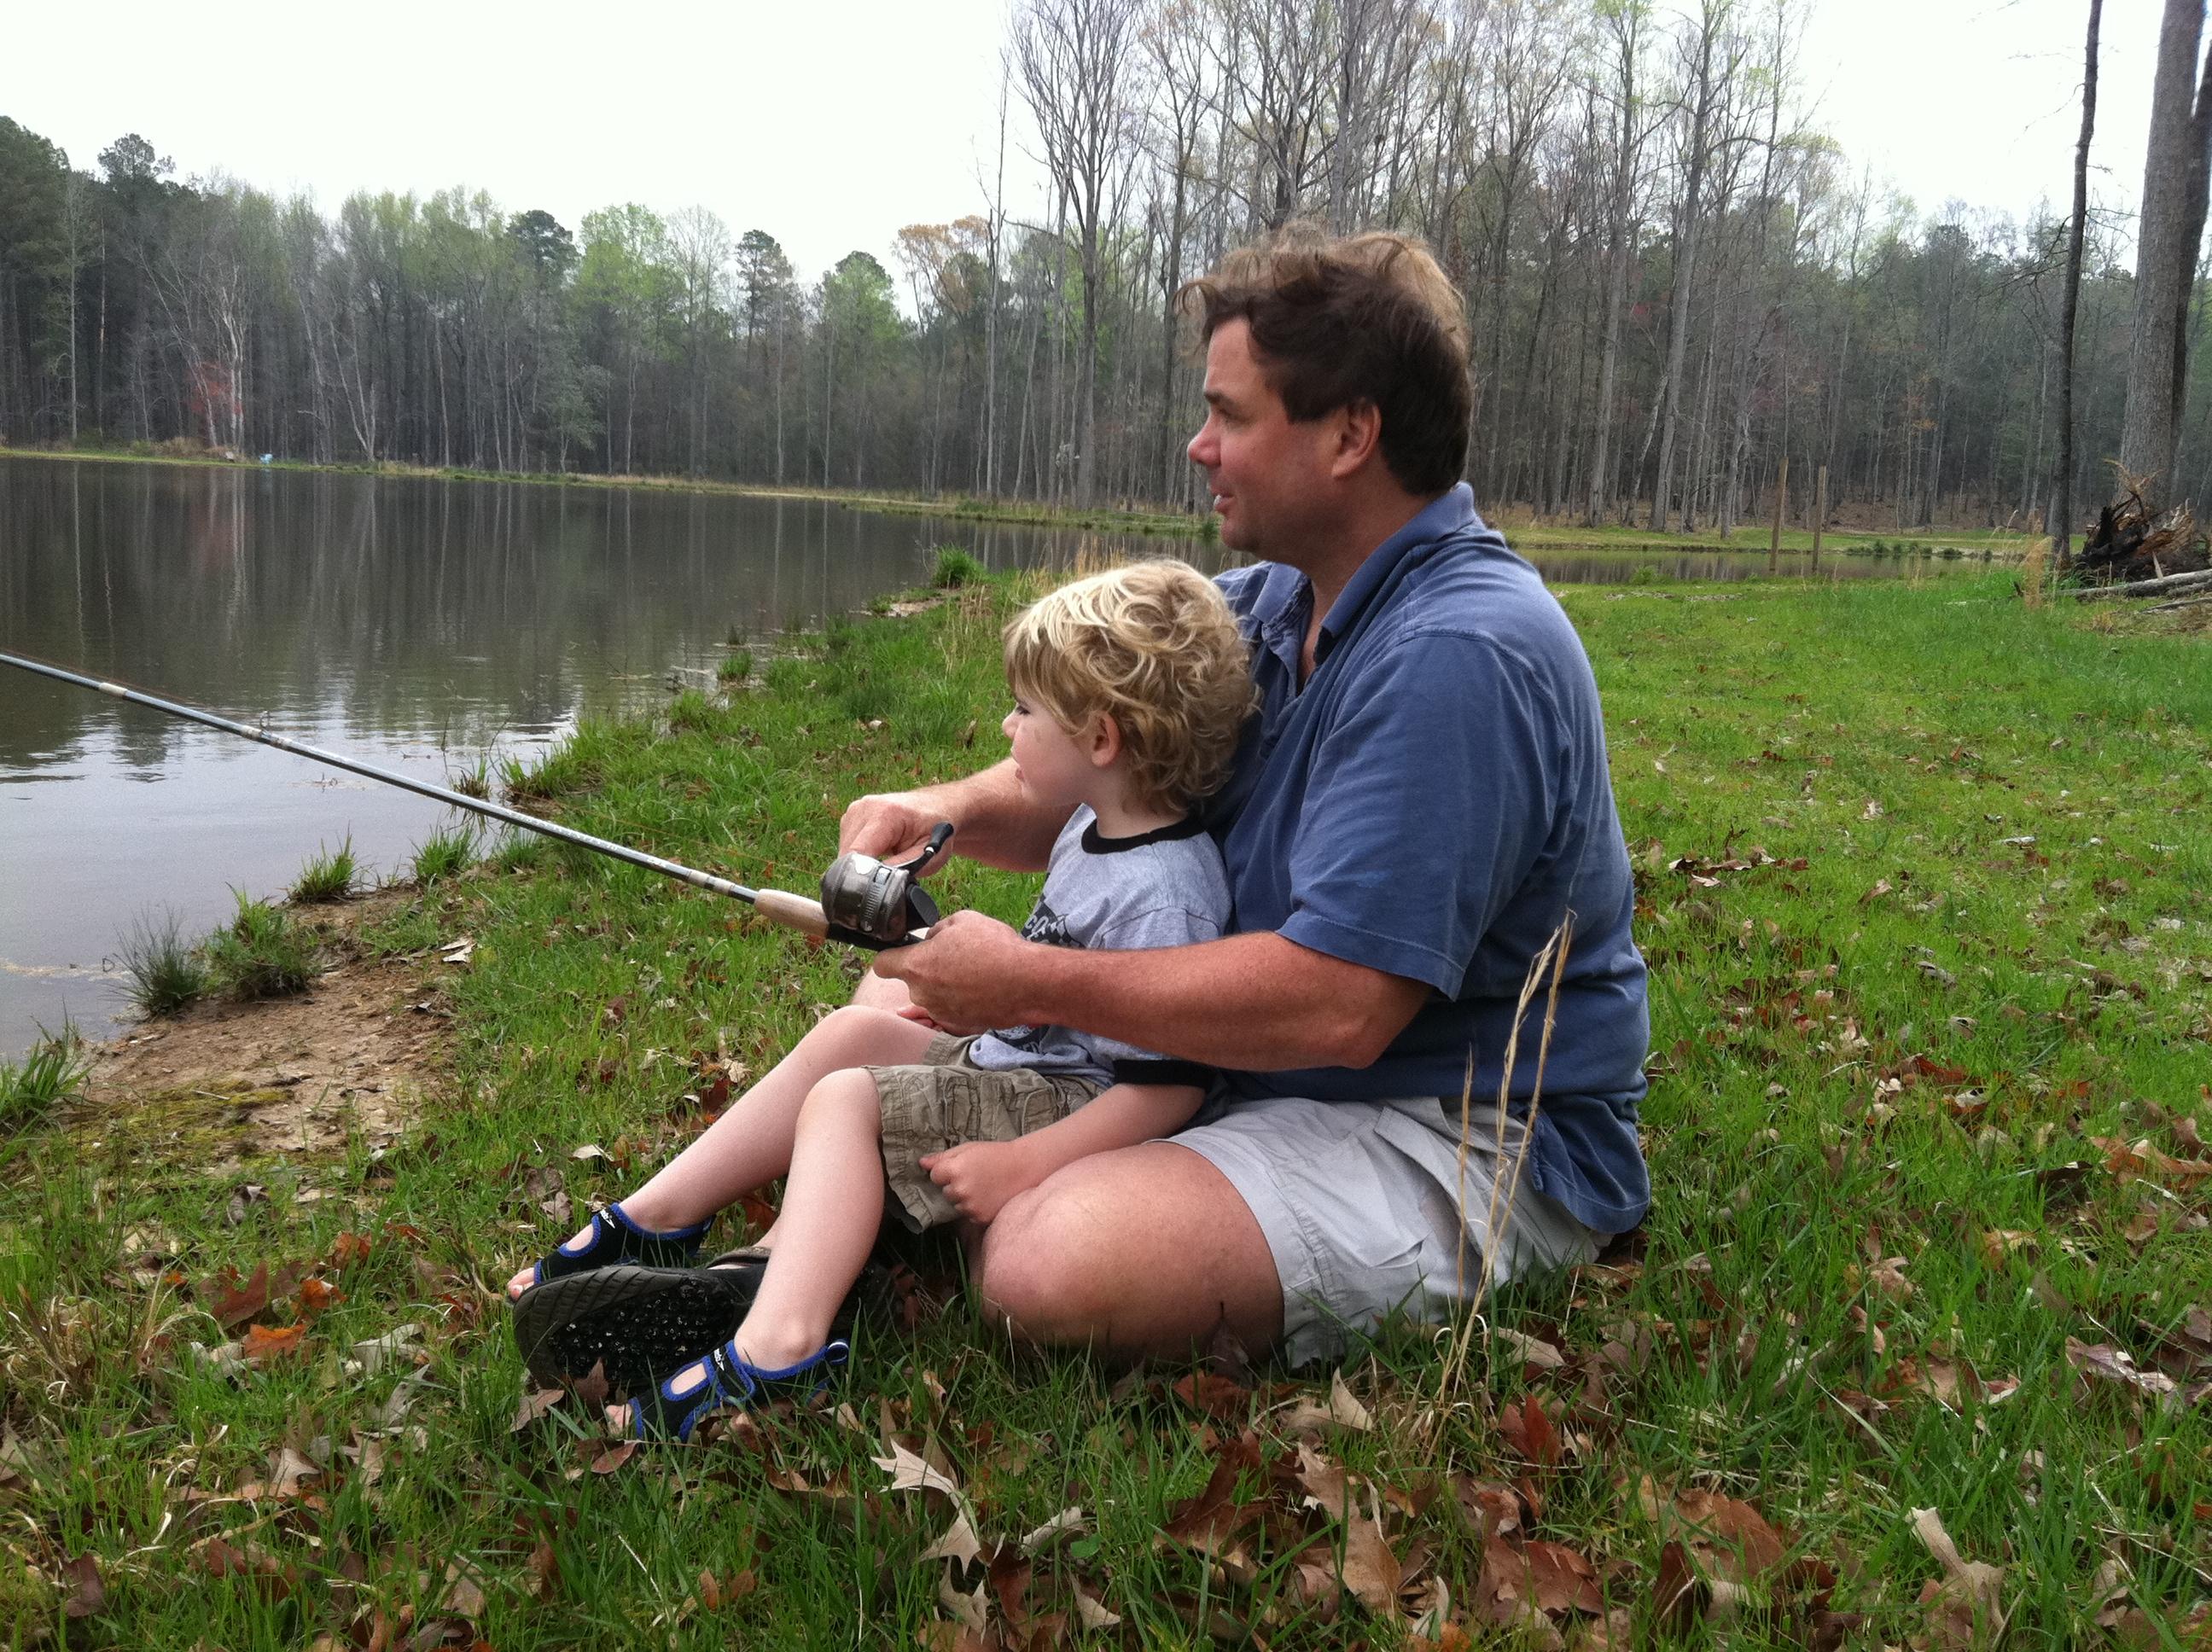 Ribolov na fotkama - Page 3 Fishing-with-dad